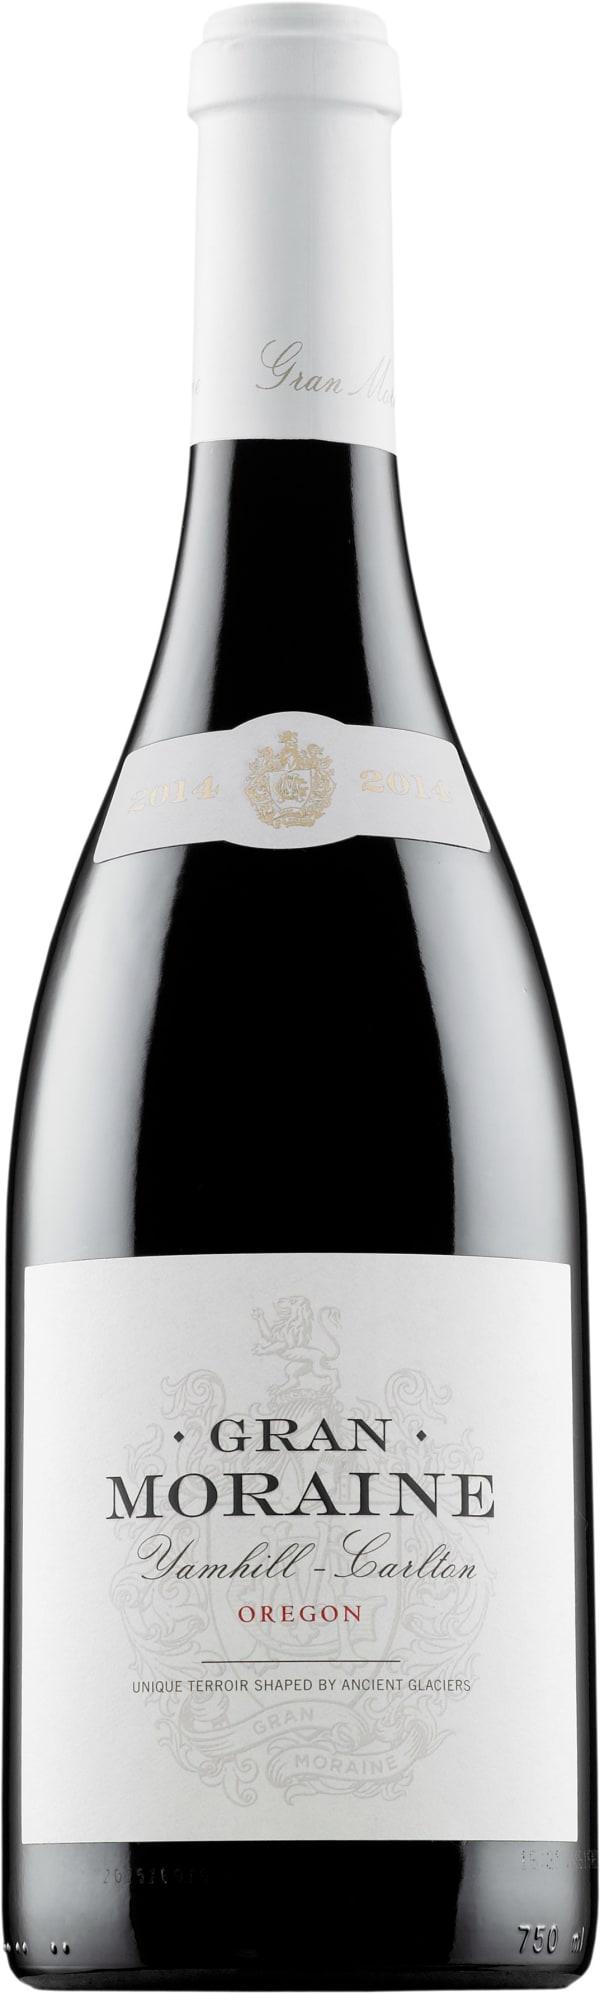 Gran Moraine Yamhill Carlton Pinot Noir 2014